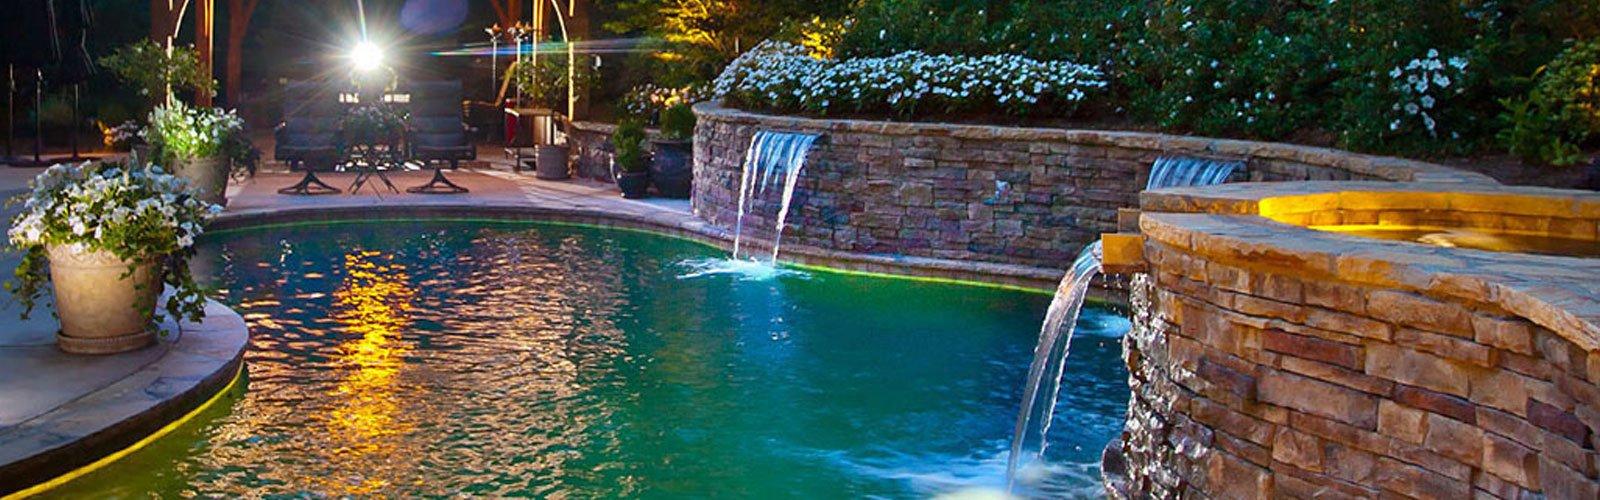 Local Pool Company Serving Dfw Metroplex Amp Surrounding